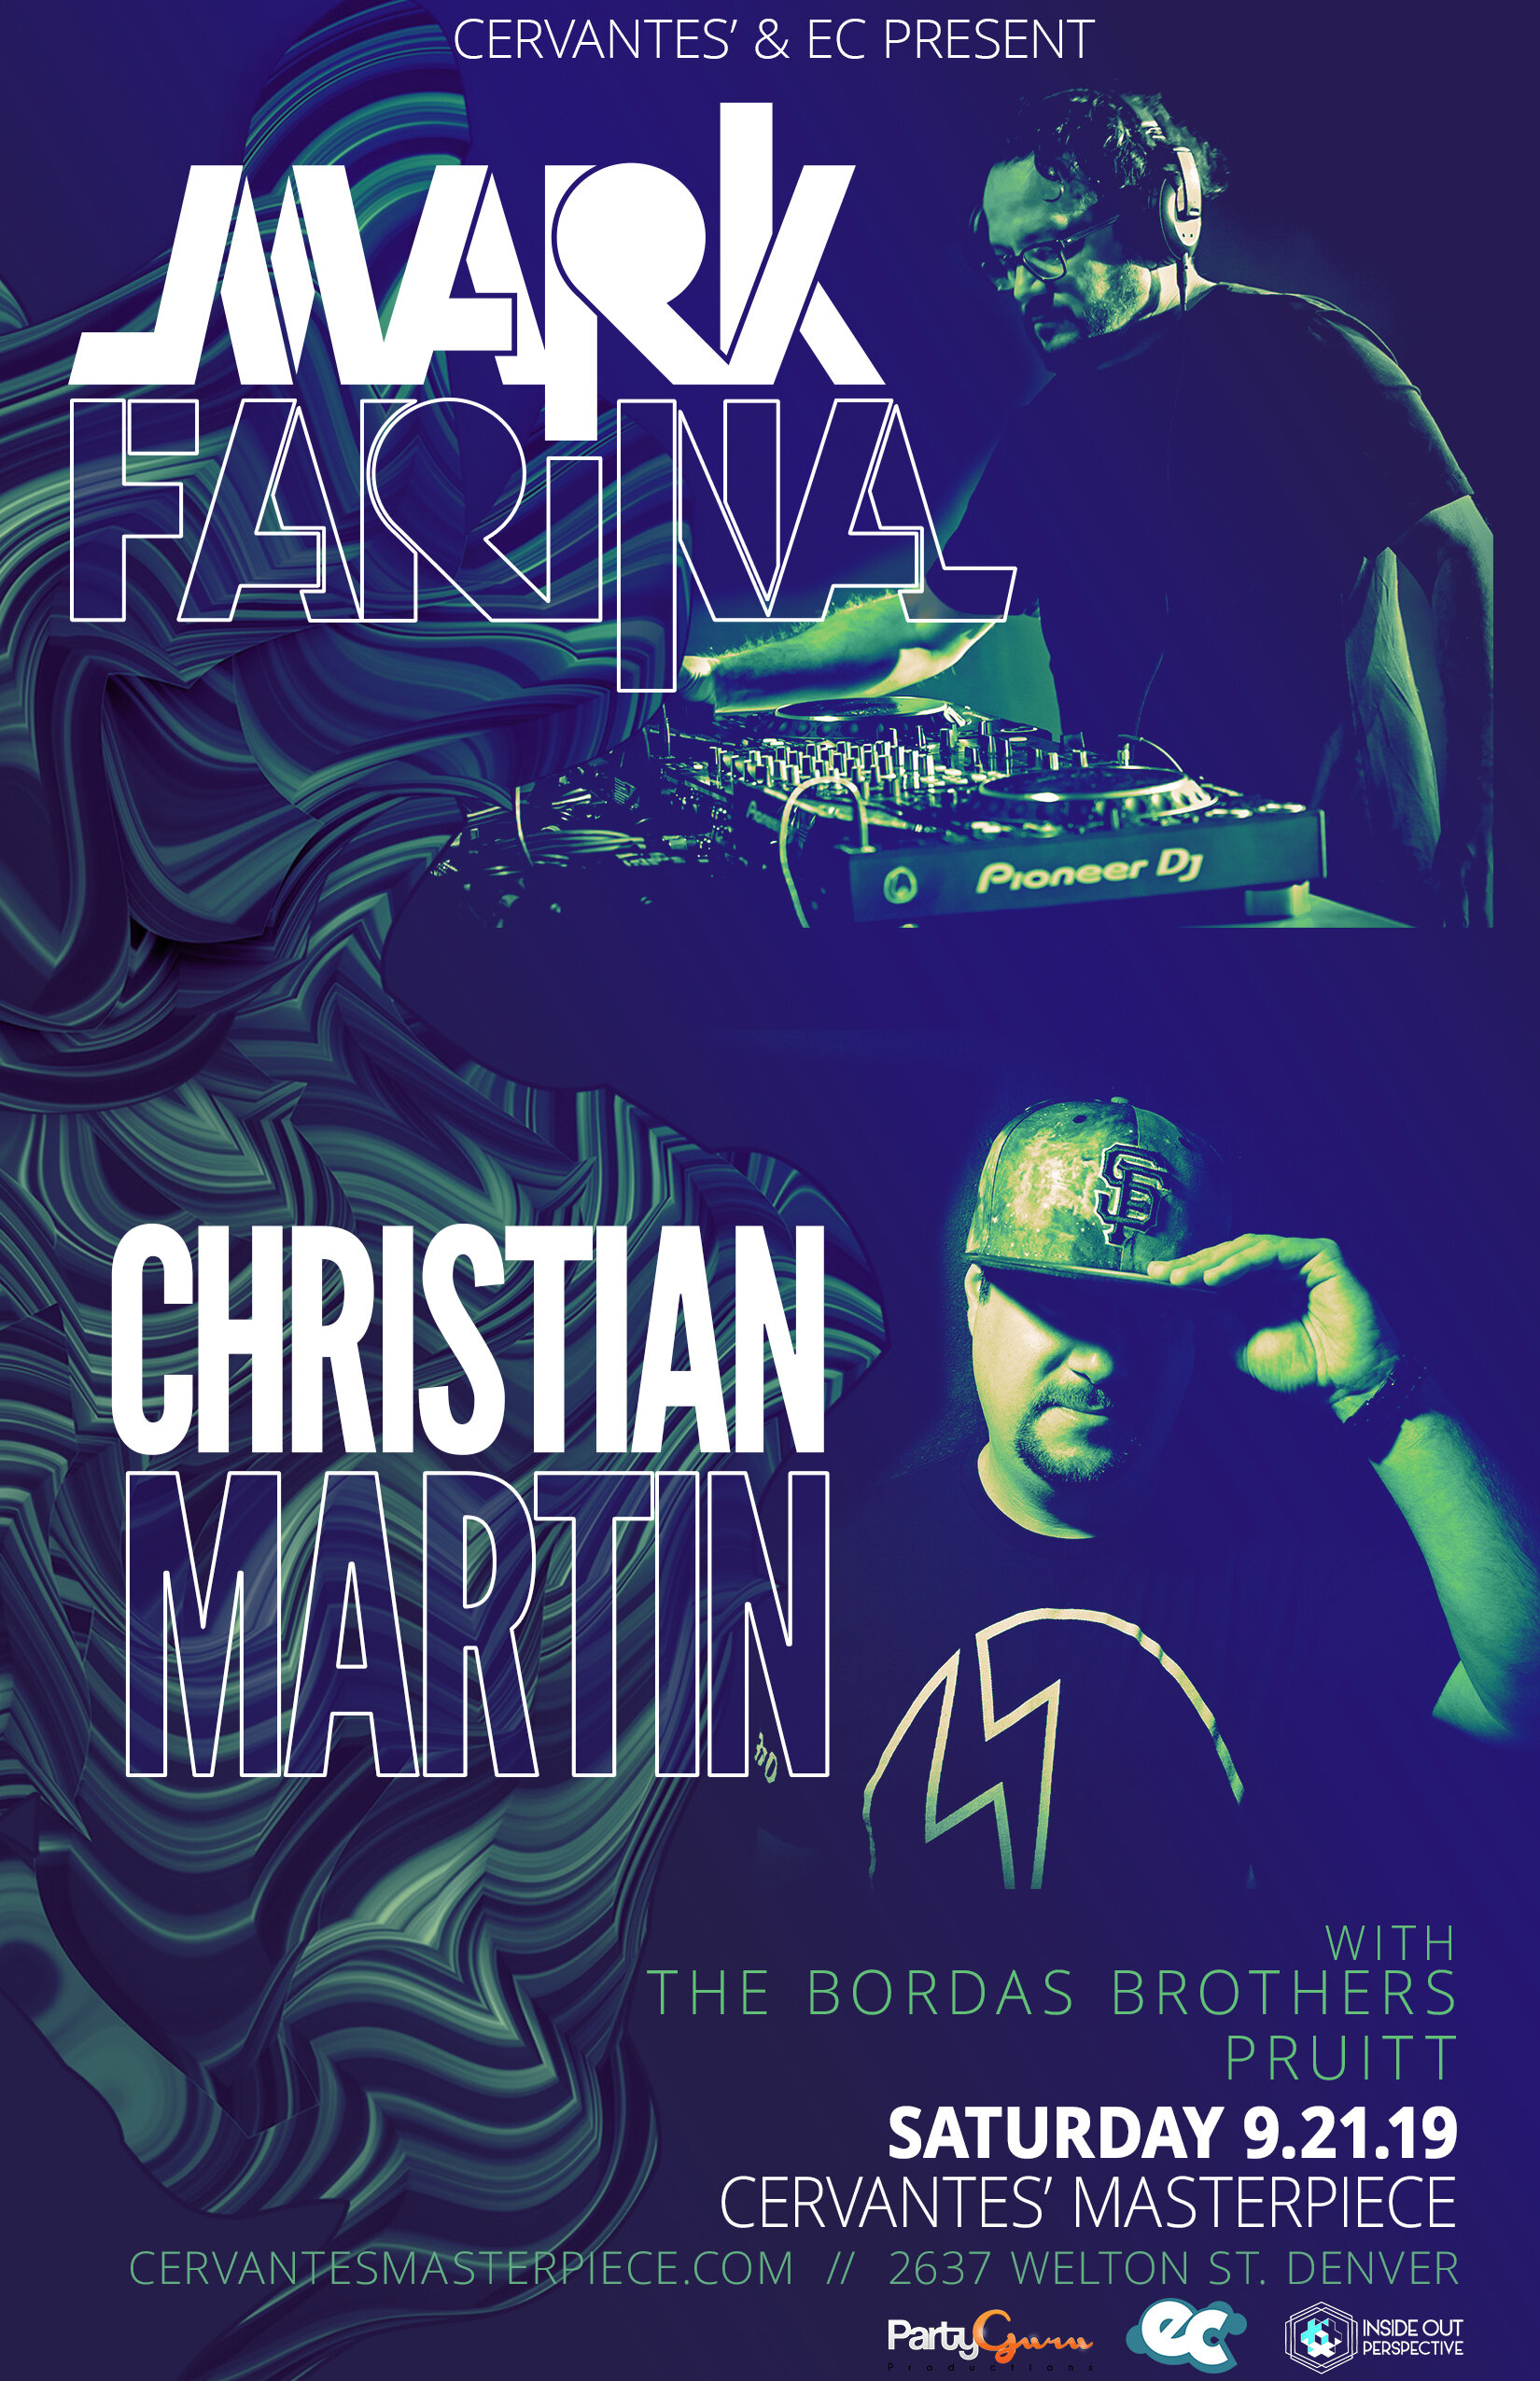 2019-09-21 - Mark Farina and Christian Martin 1.jpg